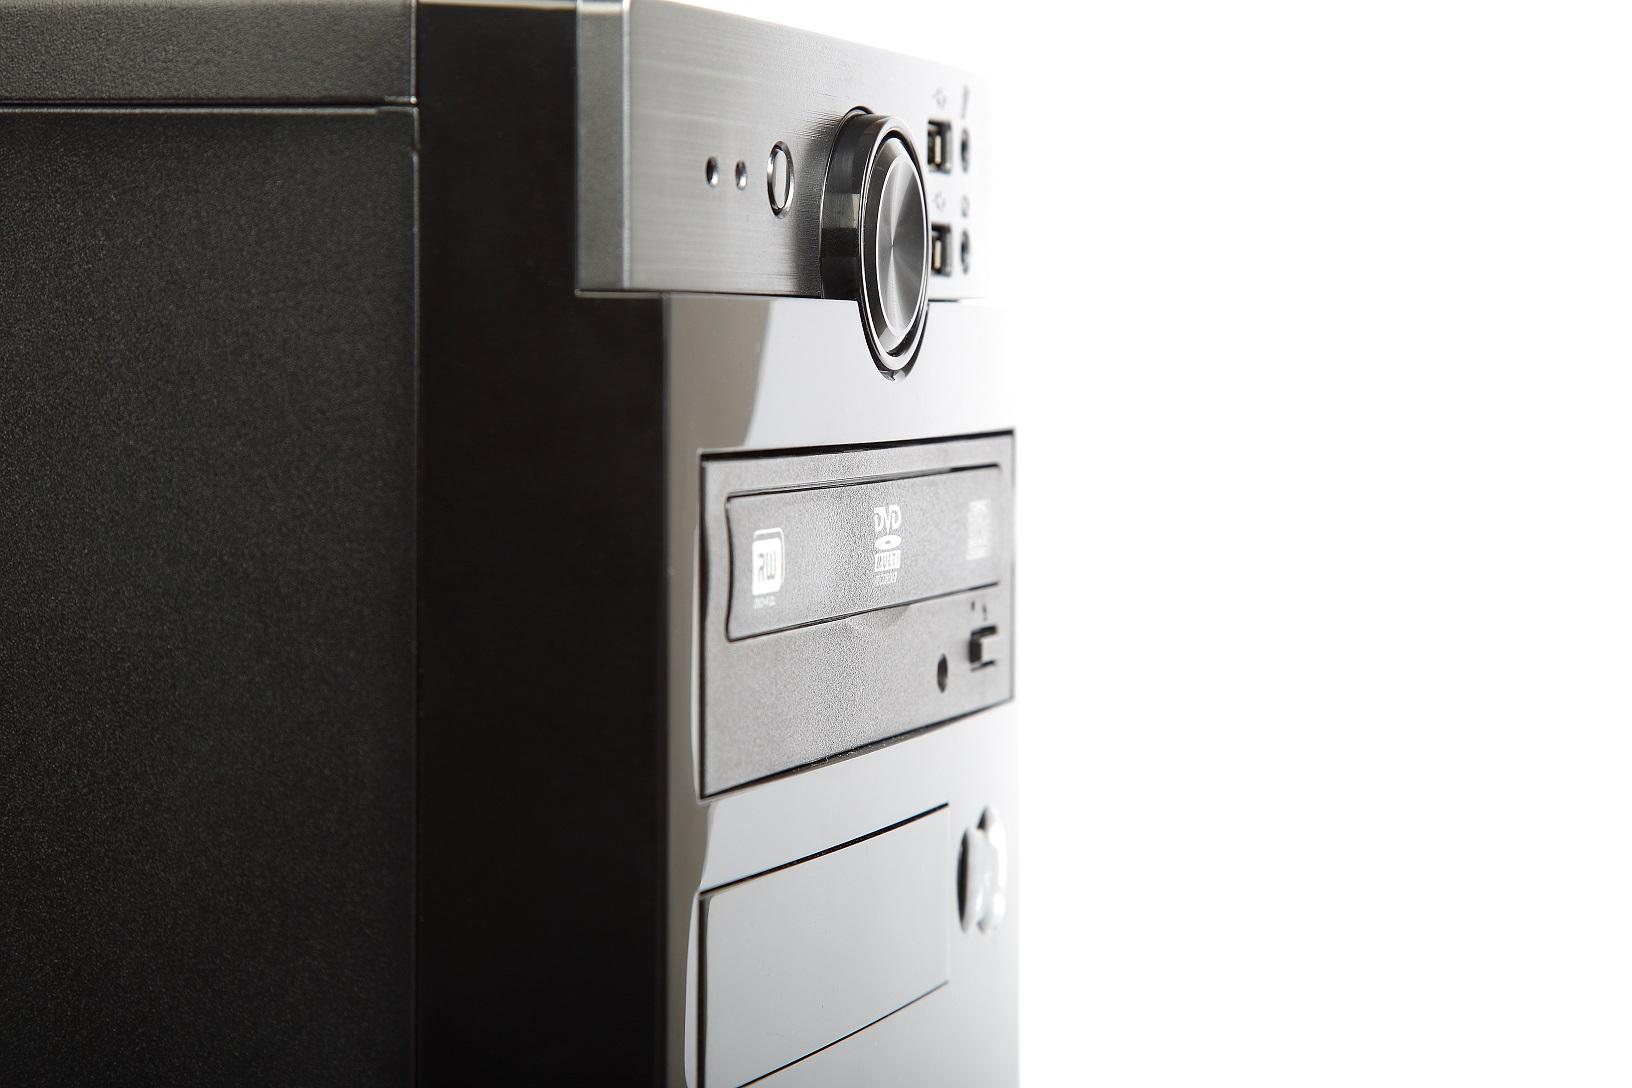 SPSE BOX<br>認証印刷アプライアンスサーバー